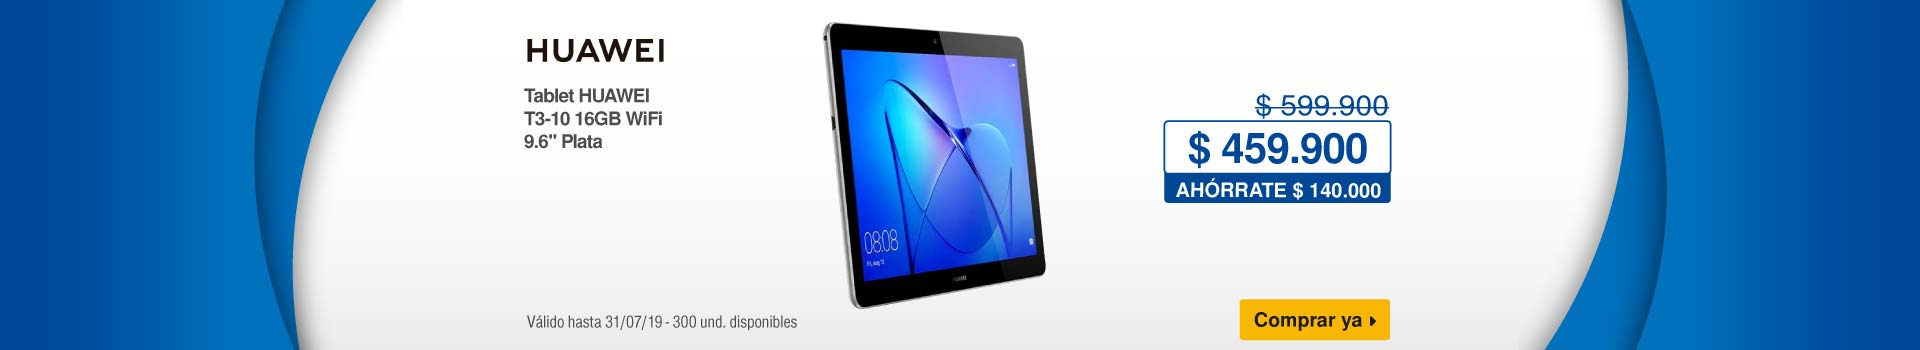 AK-KT-Huawei-Tab-T3-10-16GB-WifiCAT-TABL-computadoresytablets20_julio